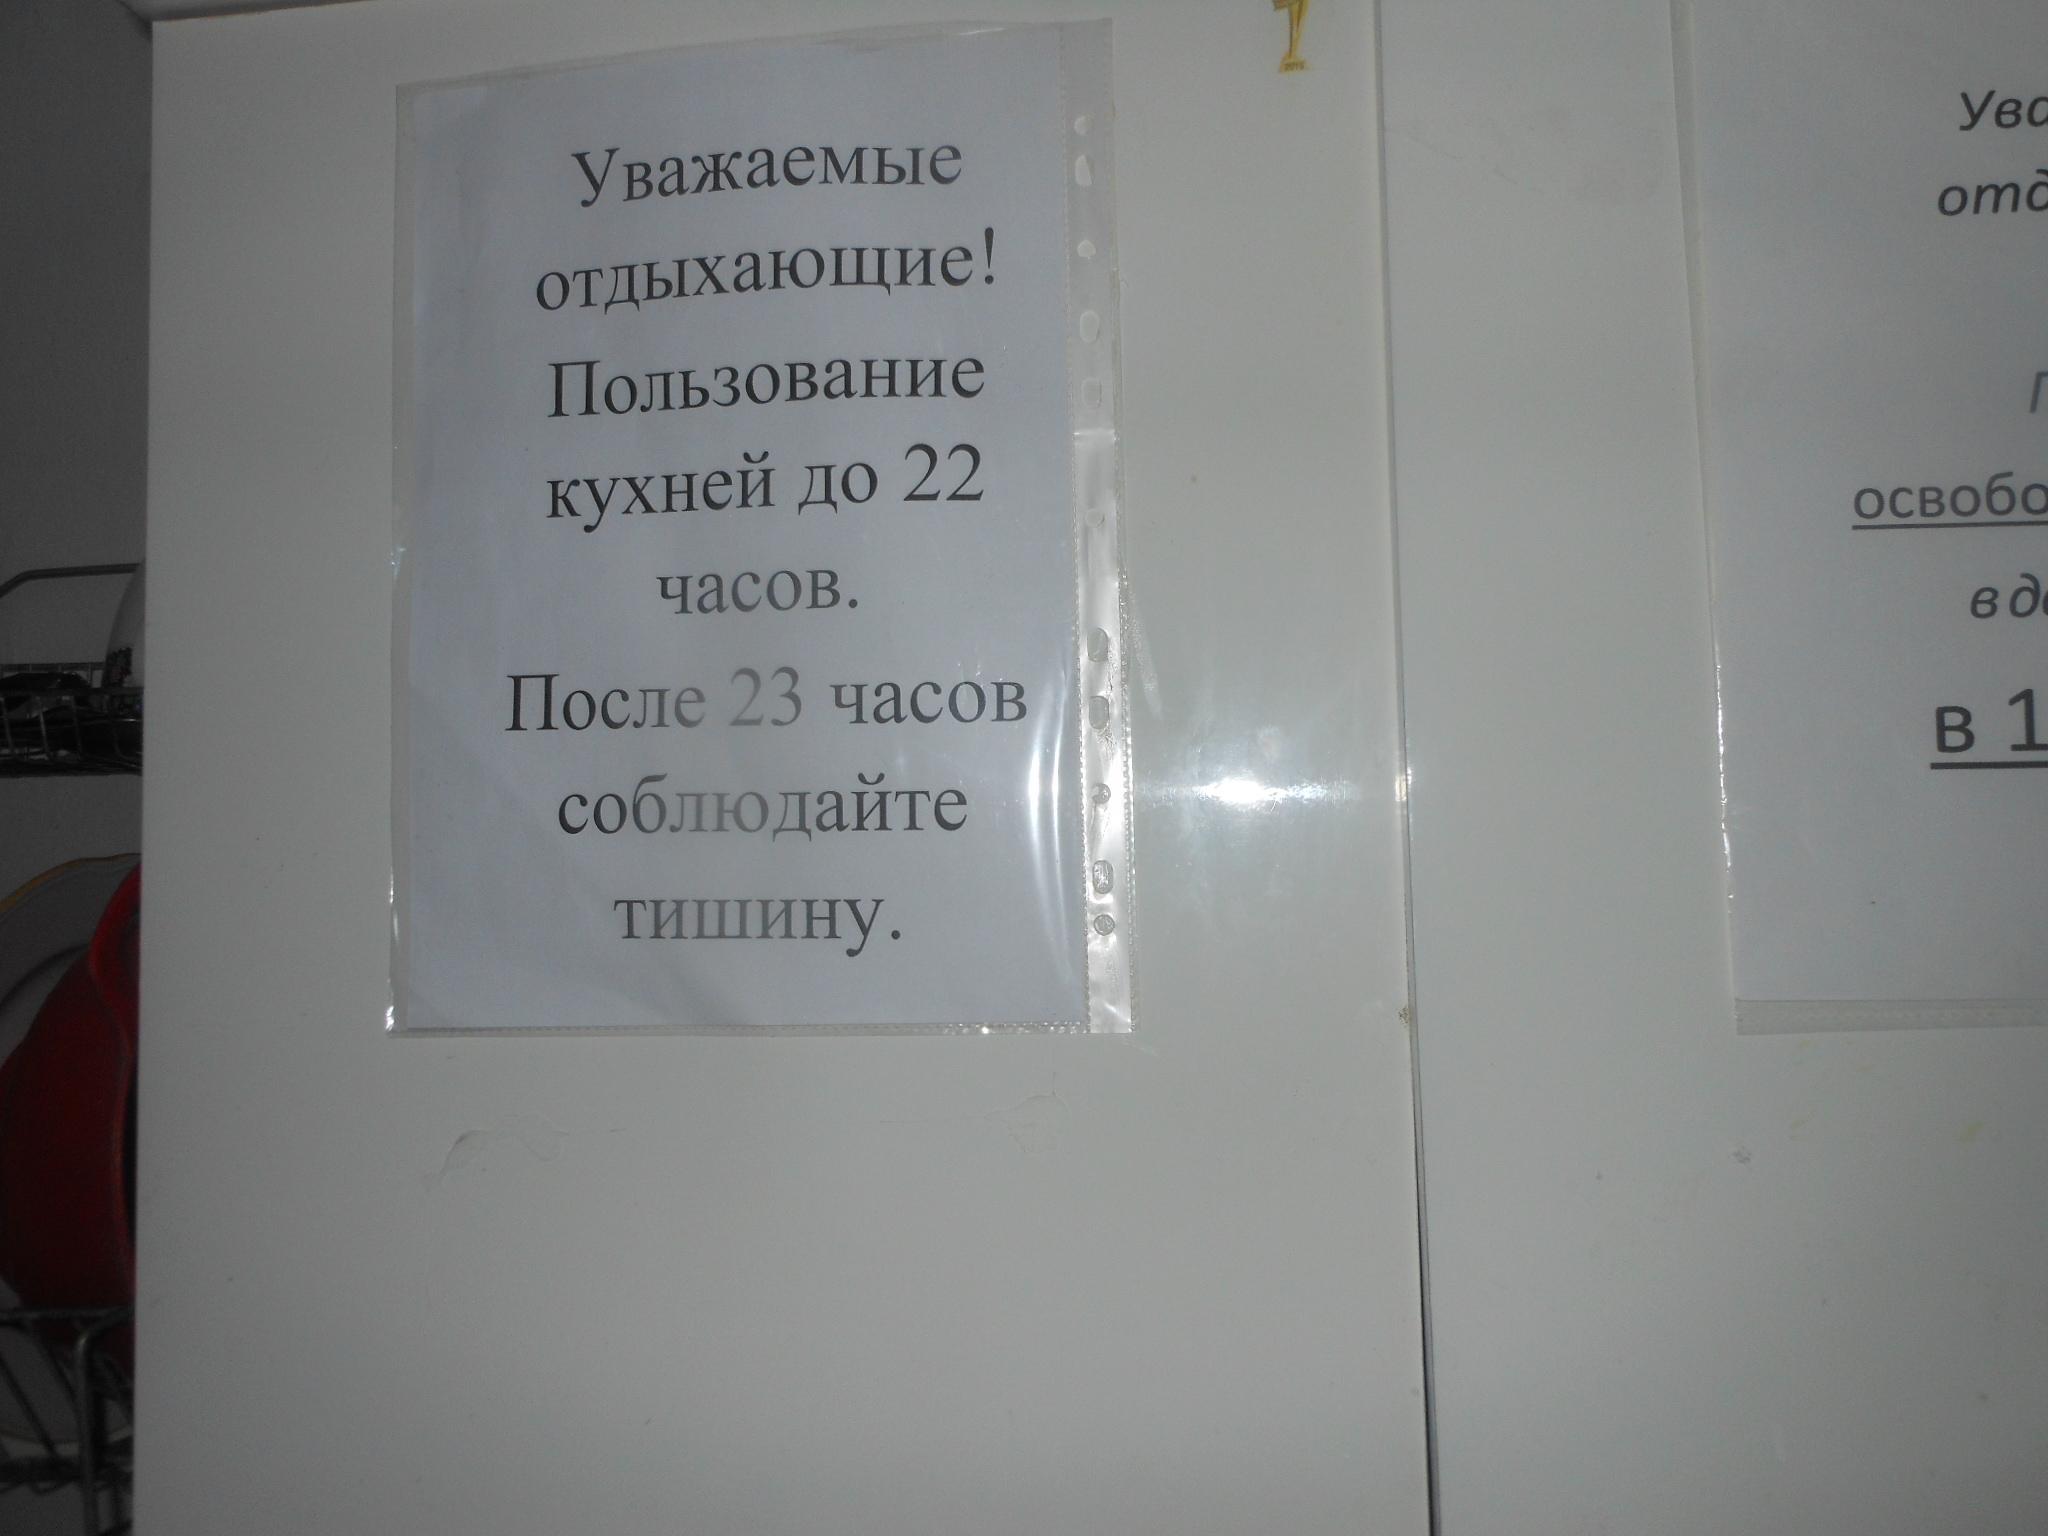 http://s7.uploads.ru/d6iMf.jpg